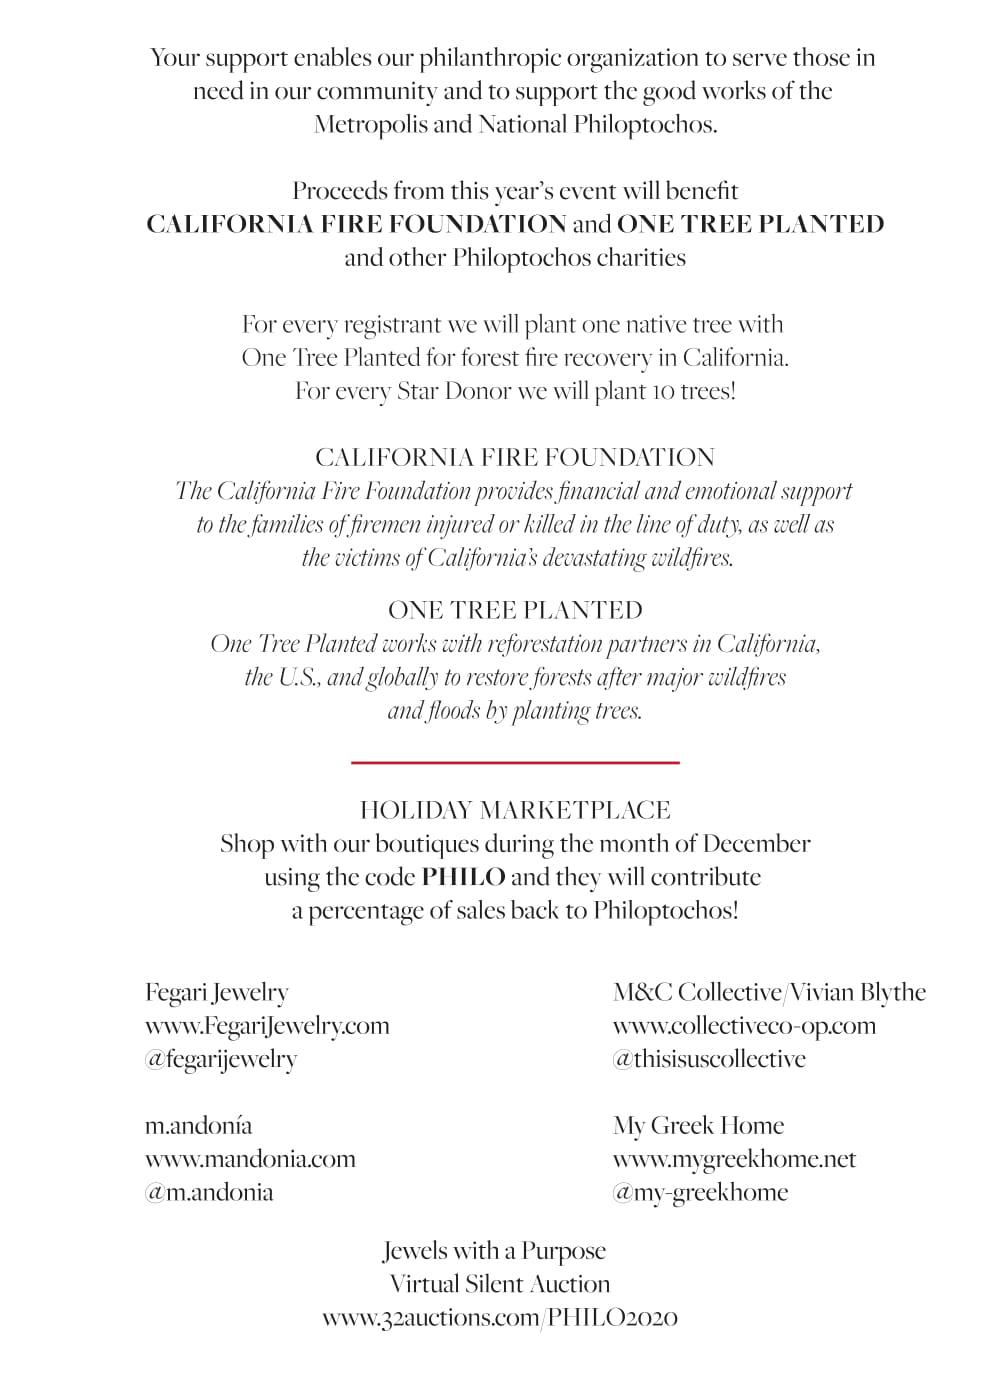 philoptochos invitation 2020 outlined-2